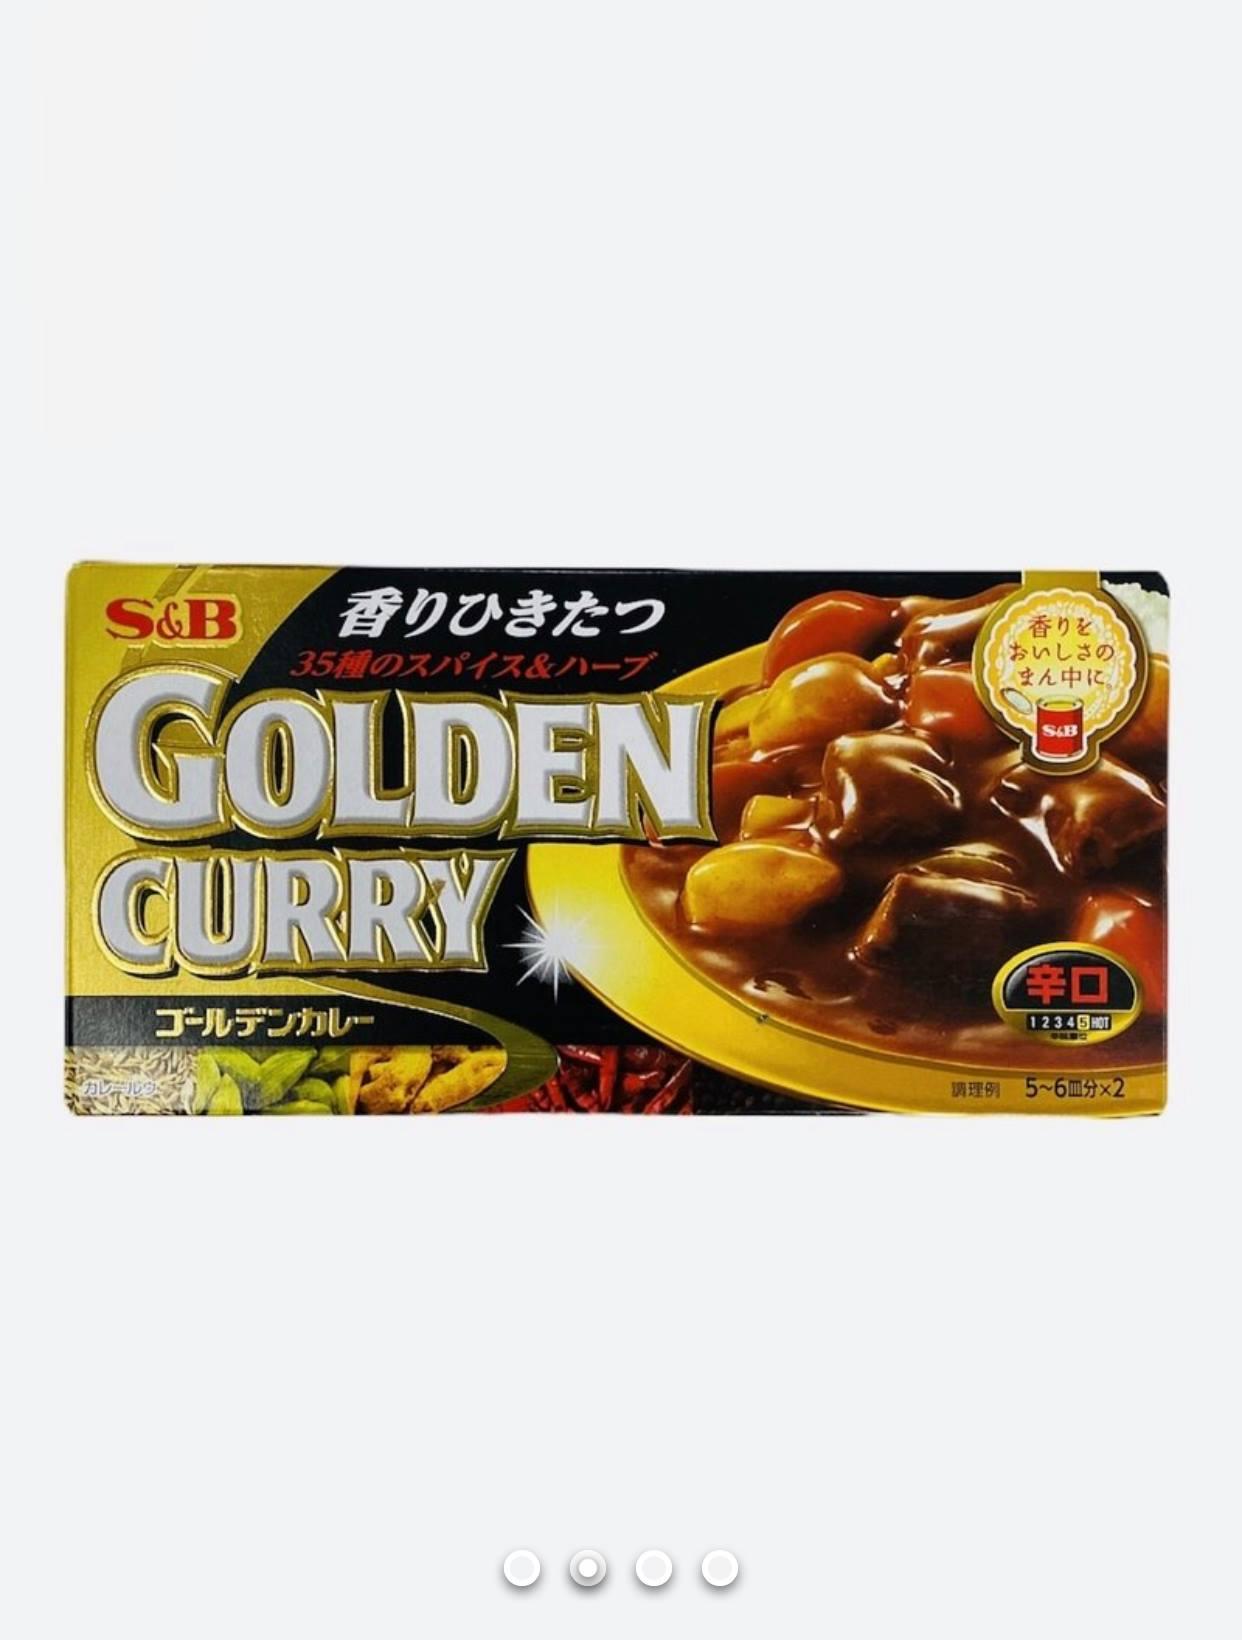 S&B愛思必 35種香料黃金咖哩-辣味/中辣/甜味 198g